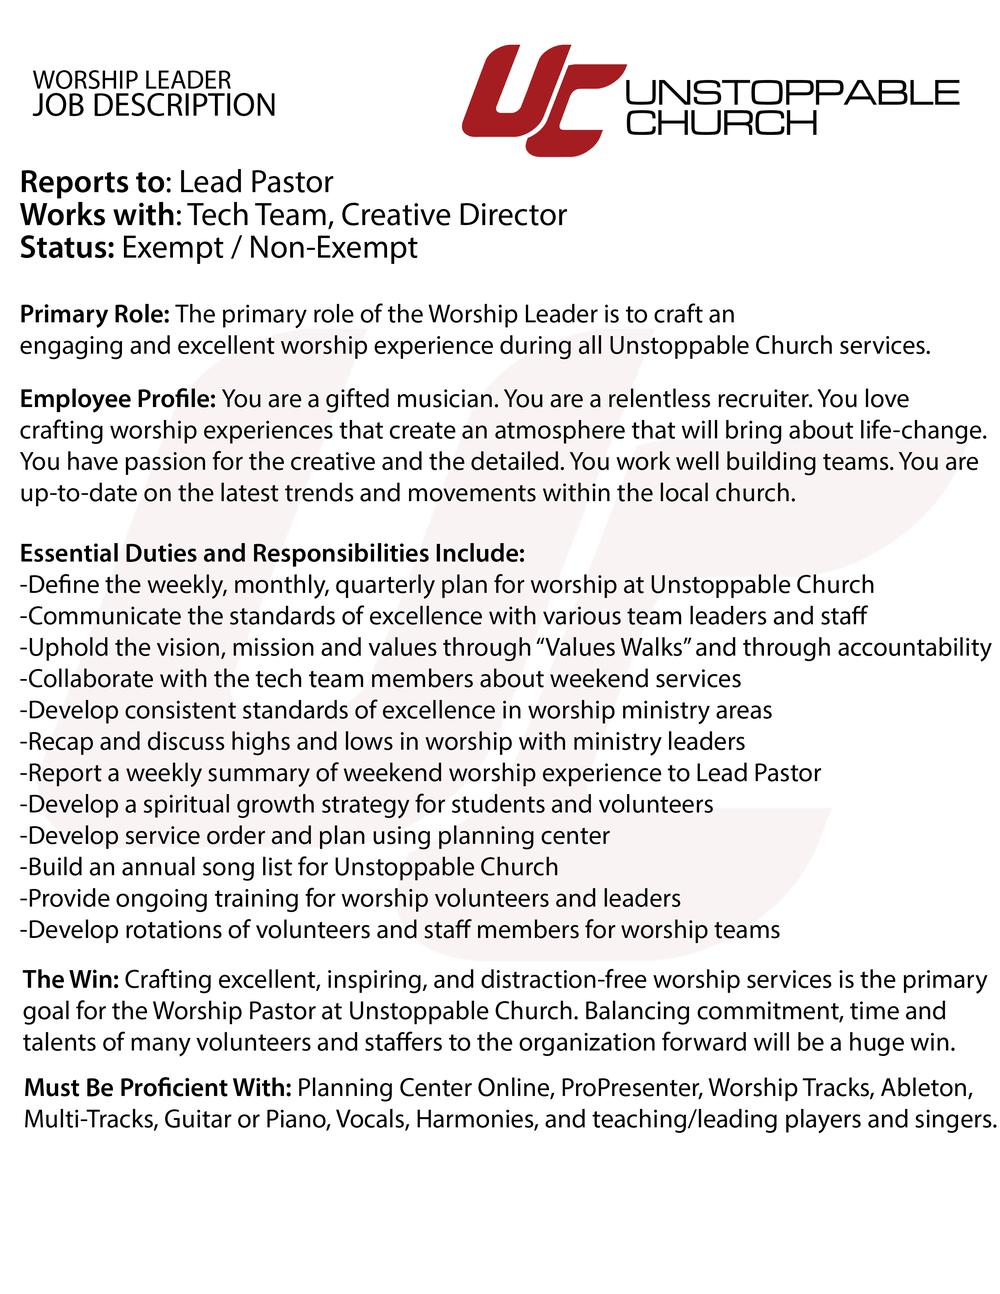 Unstoppable Church Worship PastorJob Description-01.png